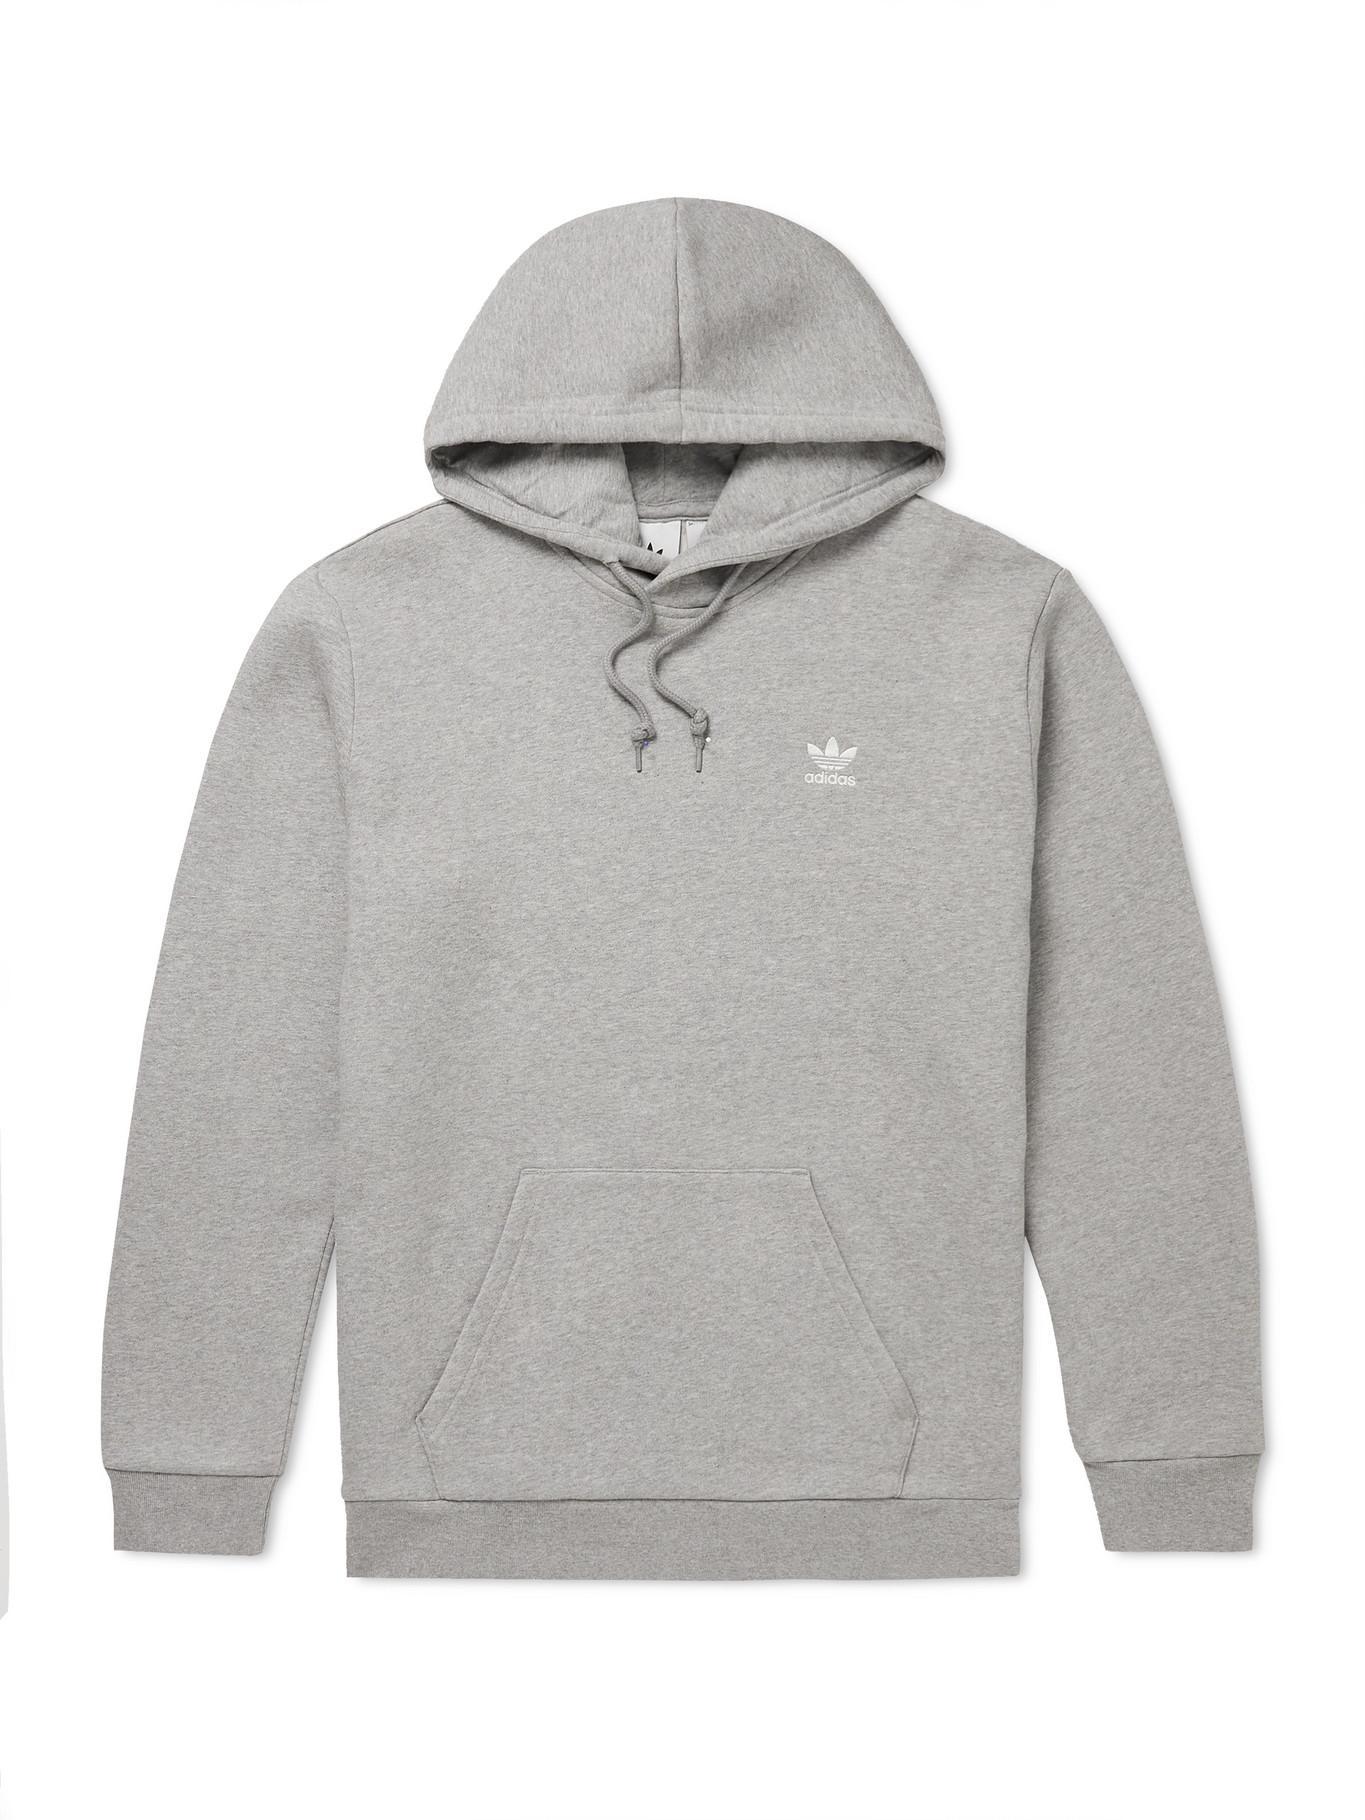 adidas Originals Logo-embroidered Cotton-blend Jersey Hoodie in ...